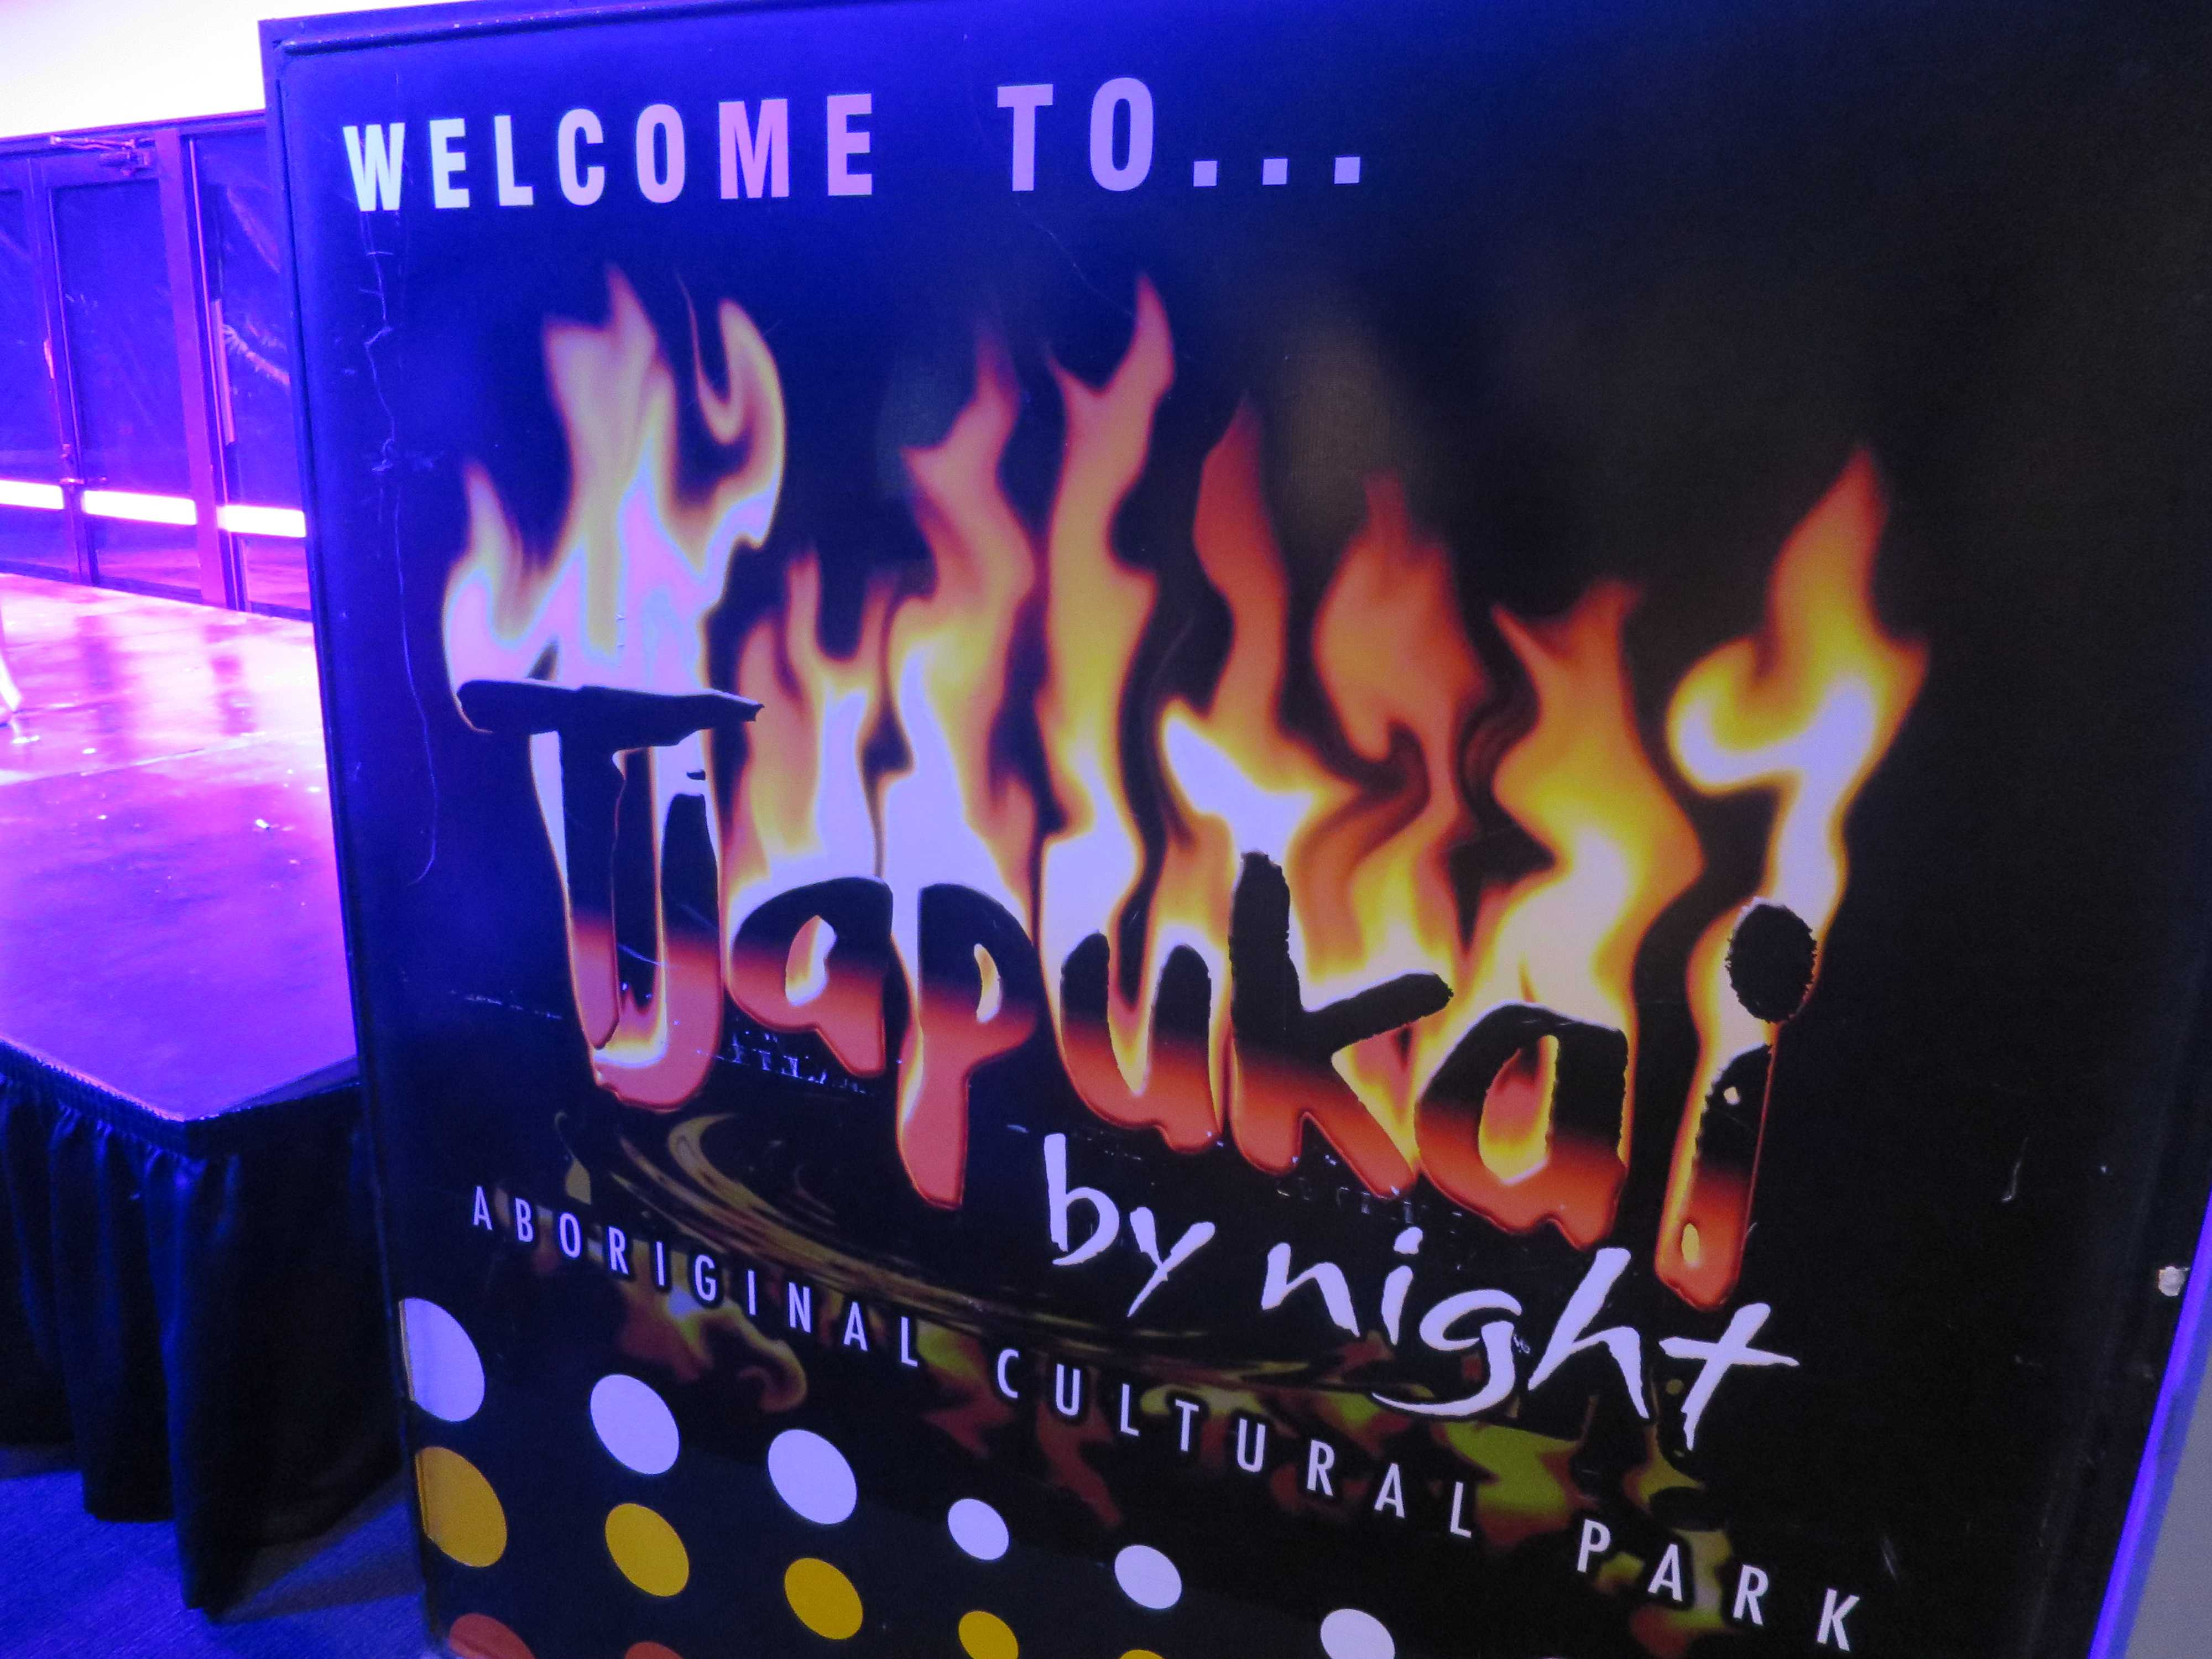 WELCOME TO Tjapukai by night - Tjapukai Aborigonal Cultural Park